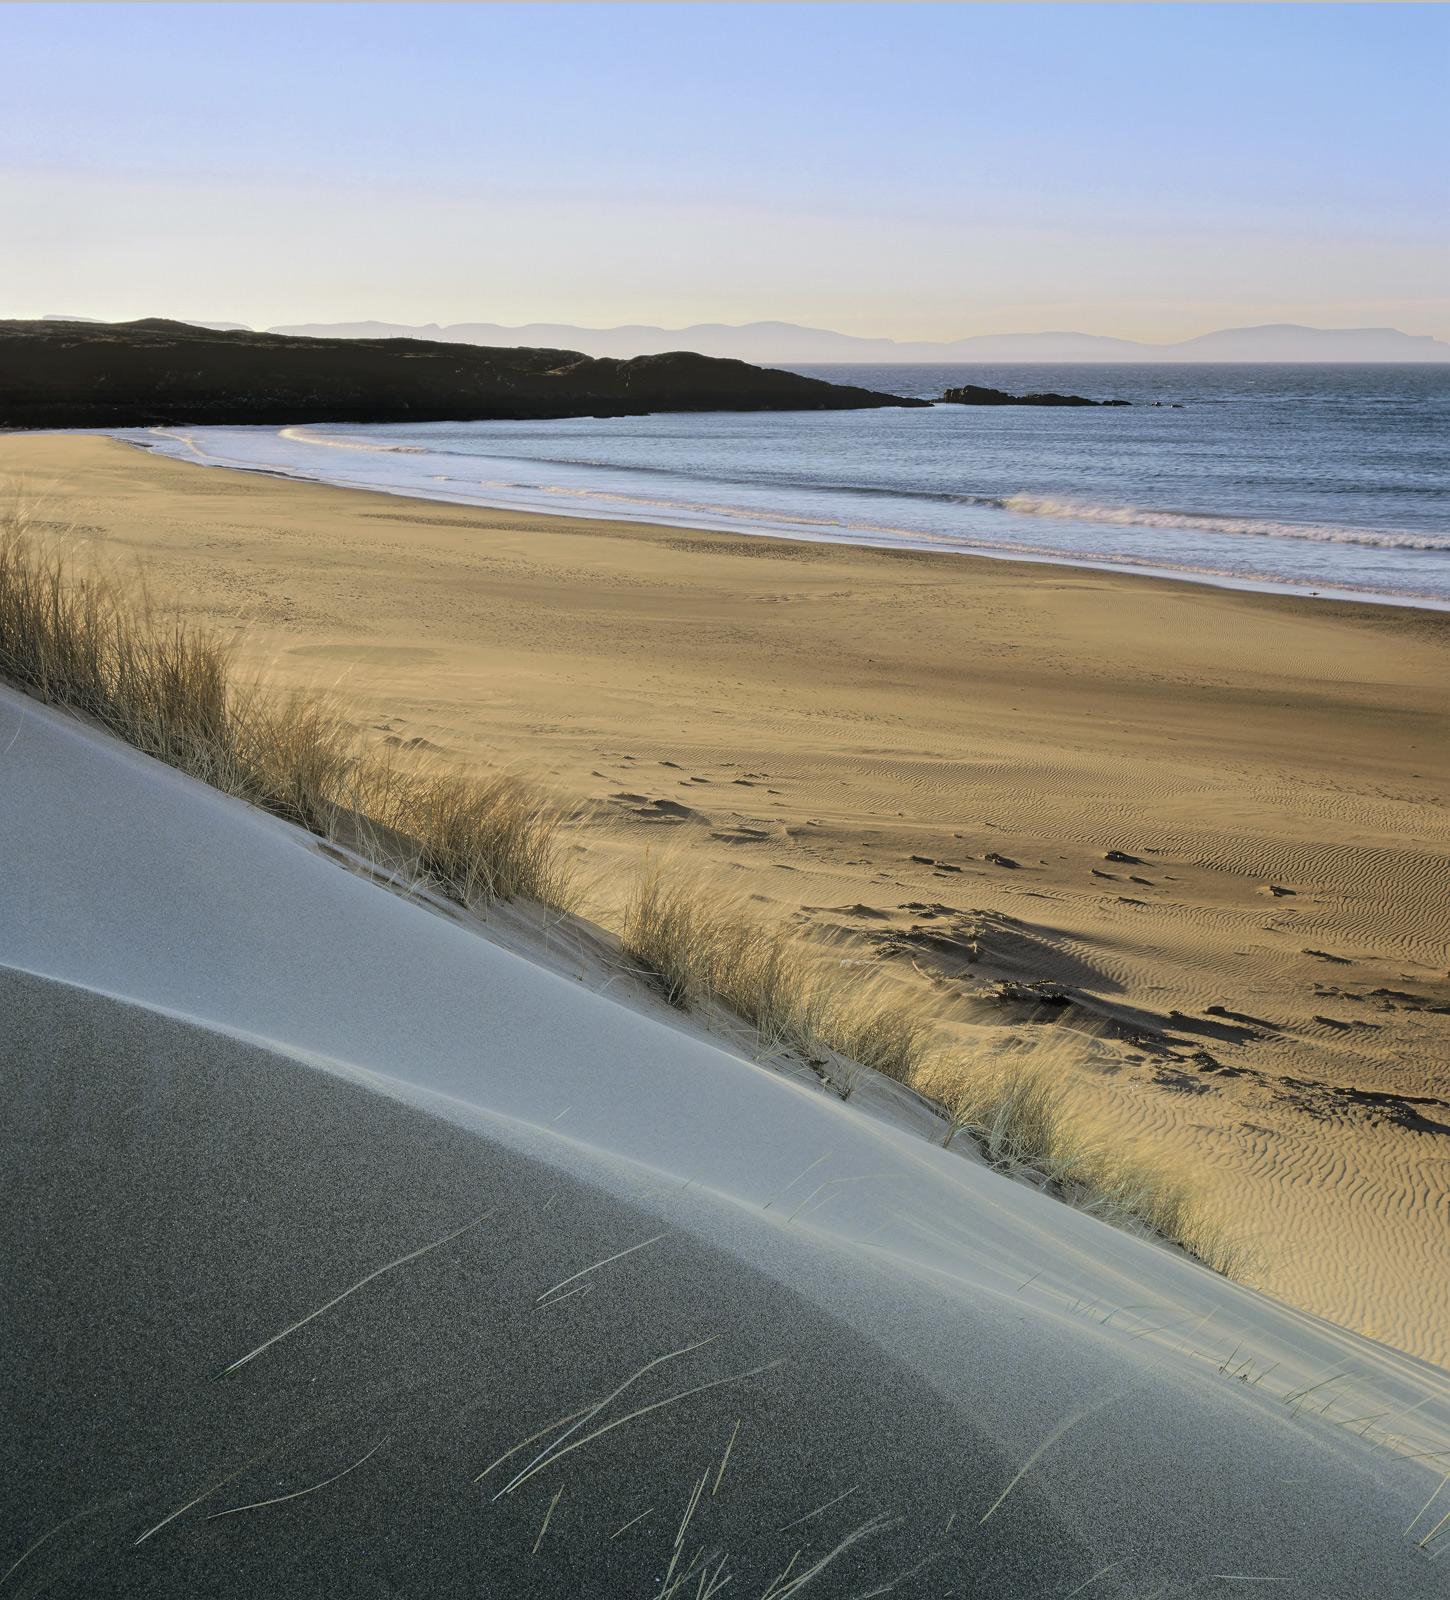 Dune Red Point, Red Point, Torridon, Scotland, enchanted, wind blown, dunes, sand, patterns, beach, cold, blue, light, b, photo